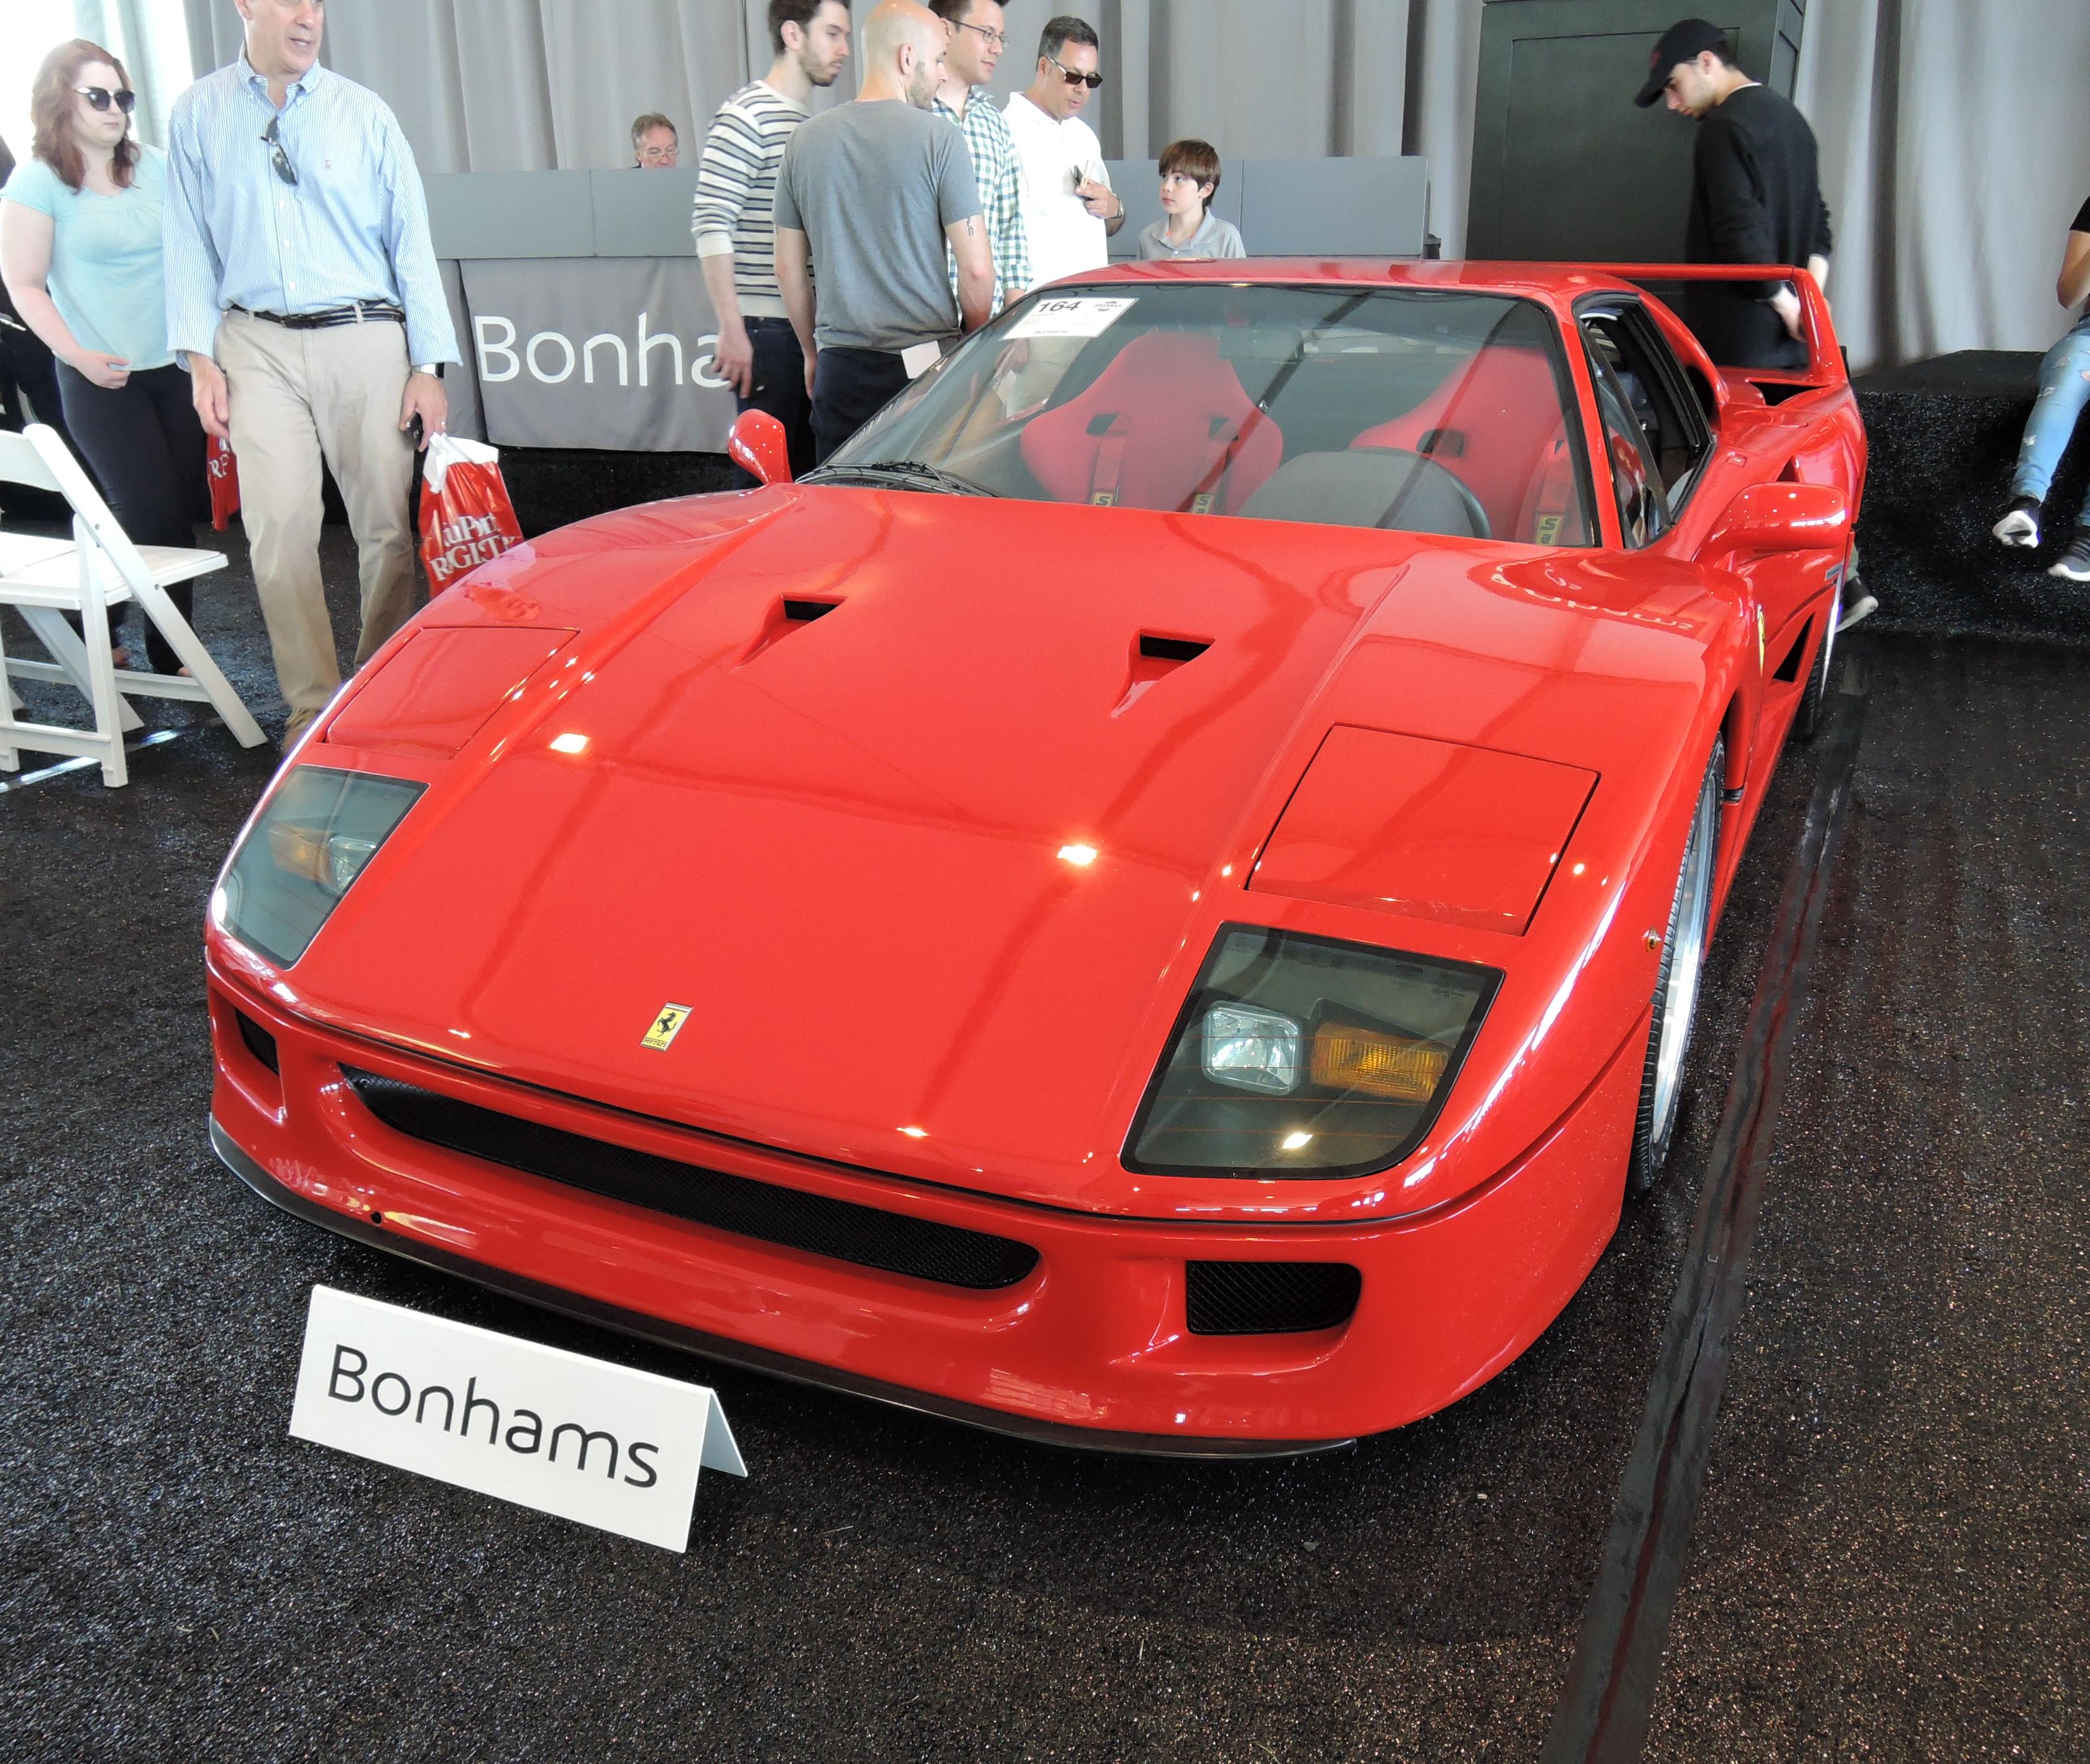 bonhams red 1990 Ferrari F40; est. $875-975K - Greenwich Concours d'Elegance 2017